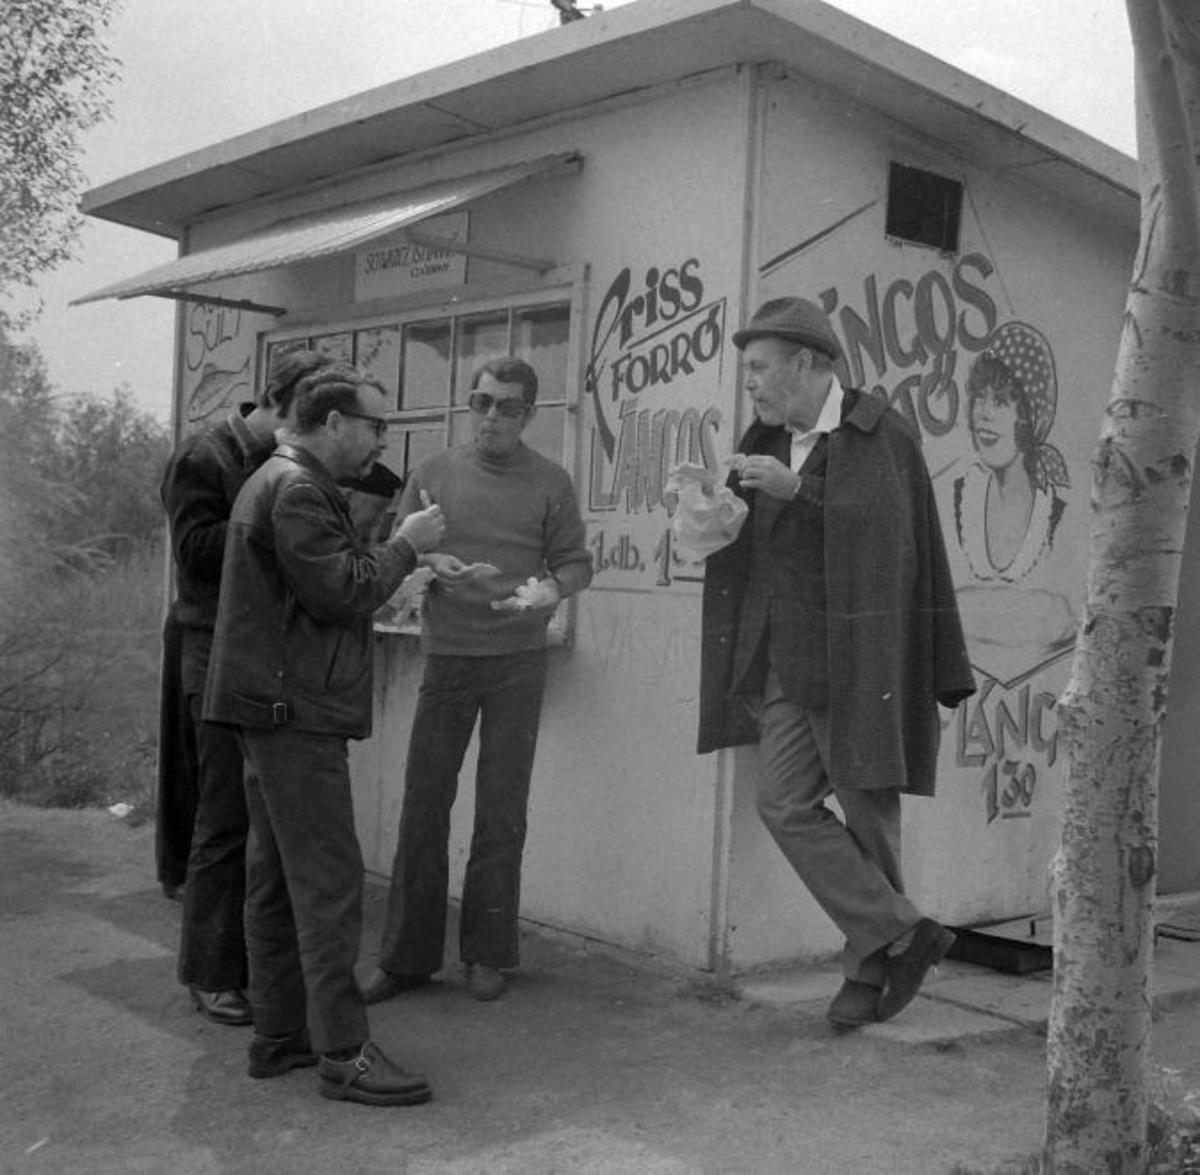 Zoltán Várkonyi, actor-director, in 1972 eating a langosh at Lake Velence - Photo: Fortepan.hu/Antal Kotnyek